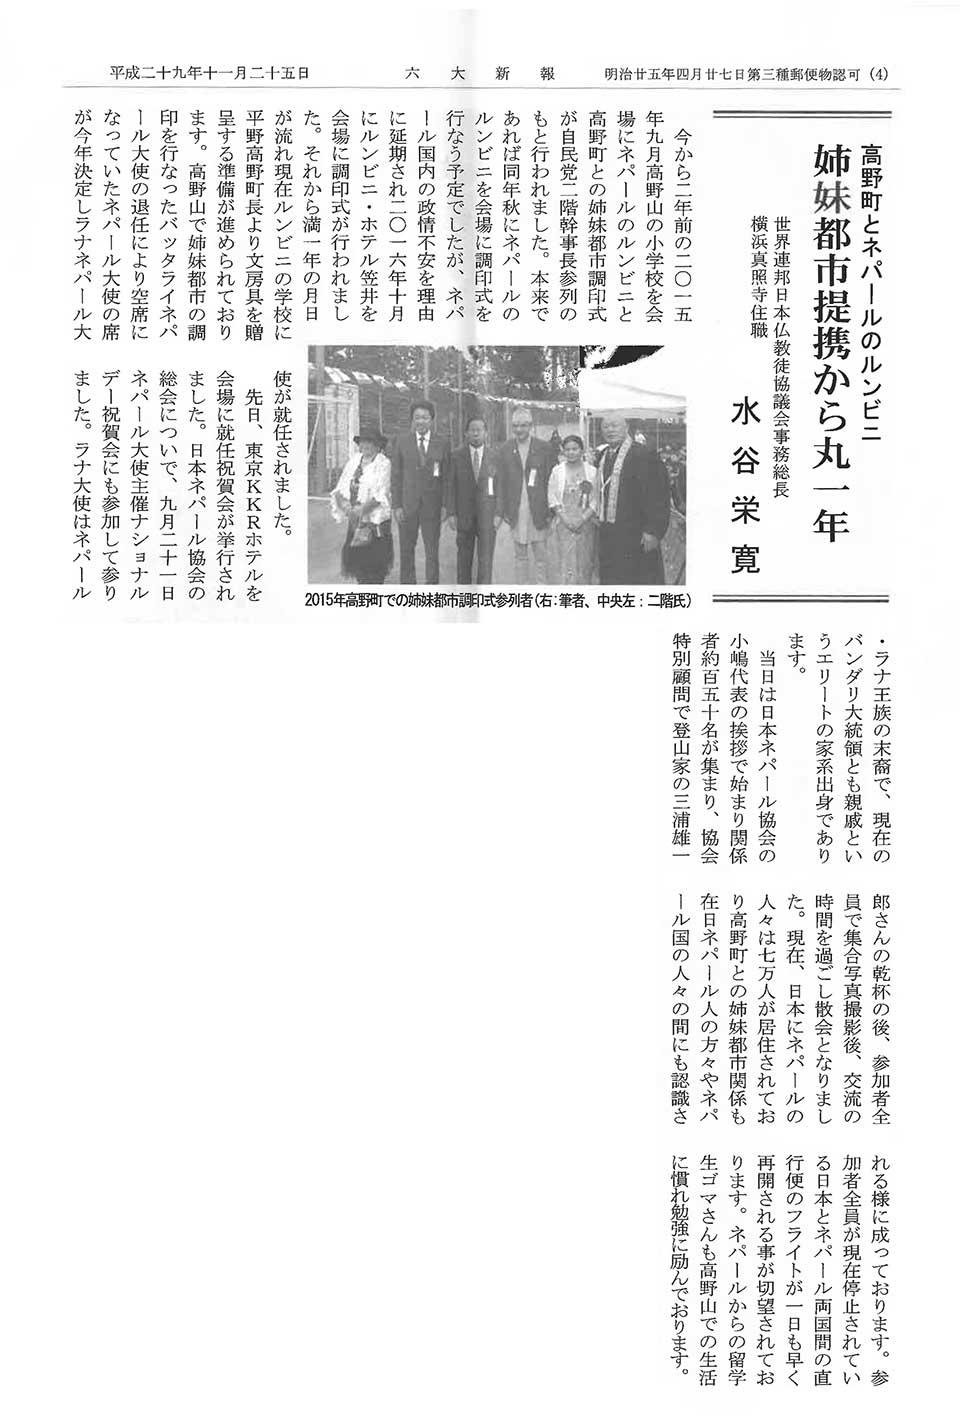 http://www.serenbutu.jp/news/20171124rokudai.jpg